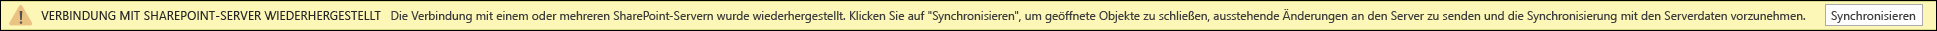 Offlinebearbeitung von mit Share-Point-Listen verknüpften Tabellen 9d3ad905-2999-4034-bc08-d6bb8168002a.png